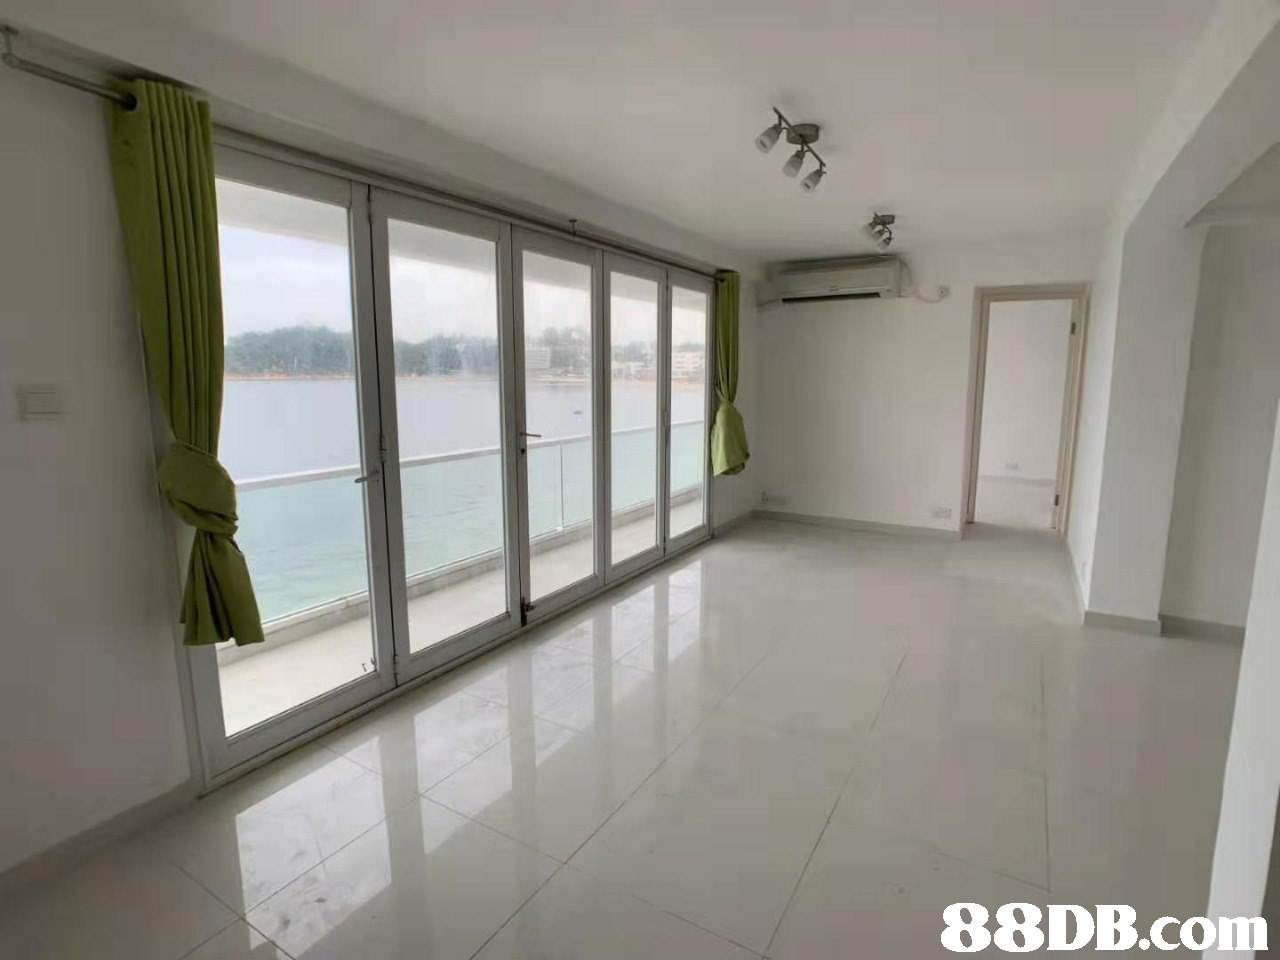 Property,Room,Building,Floor,Real estate